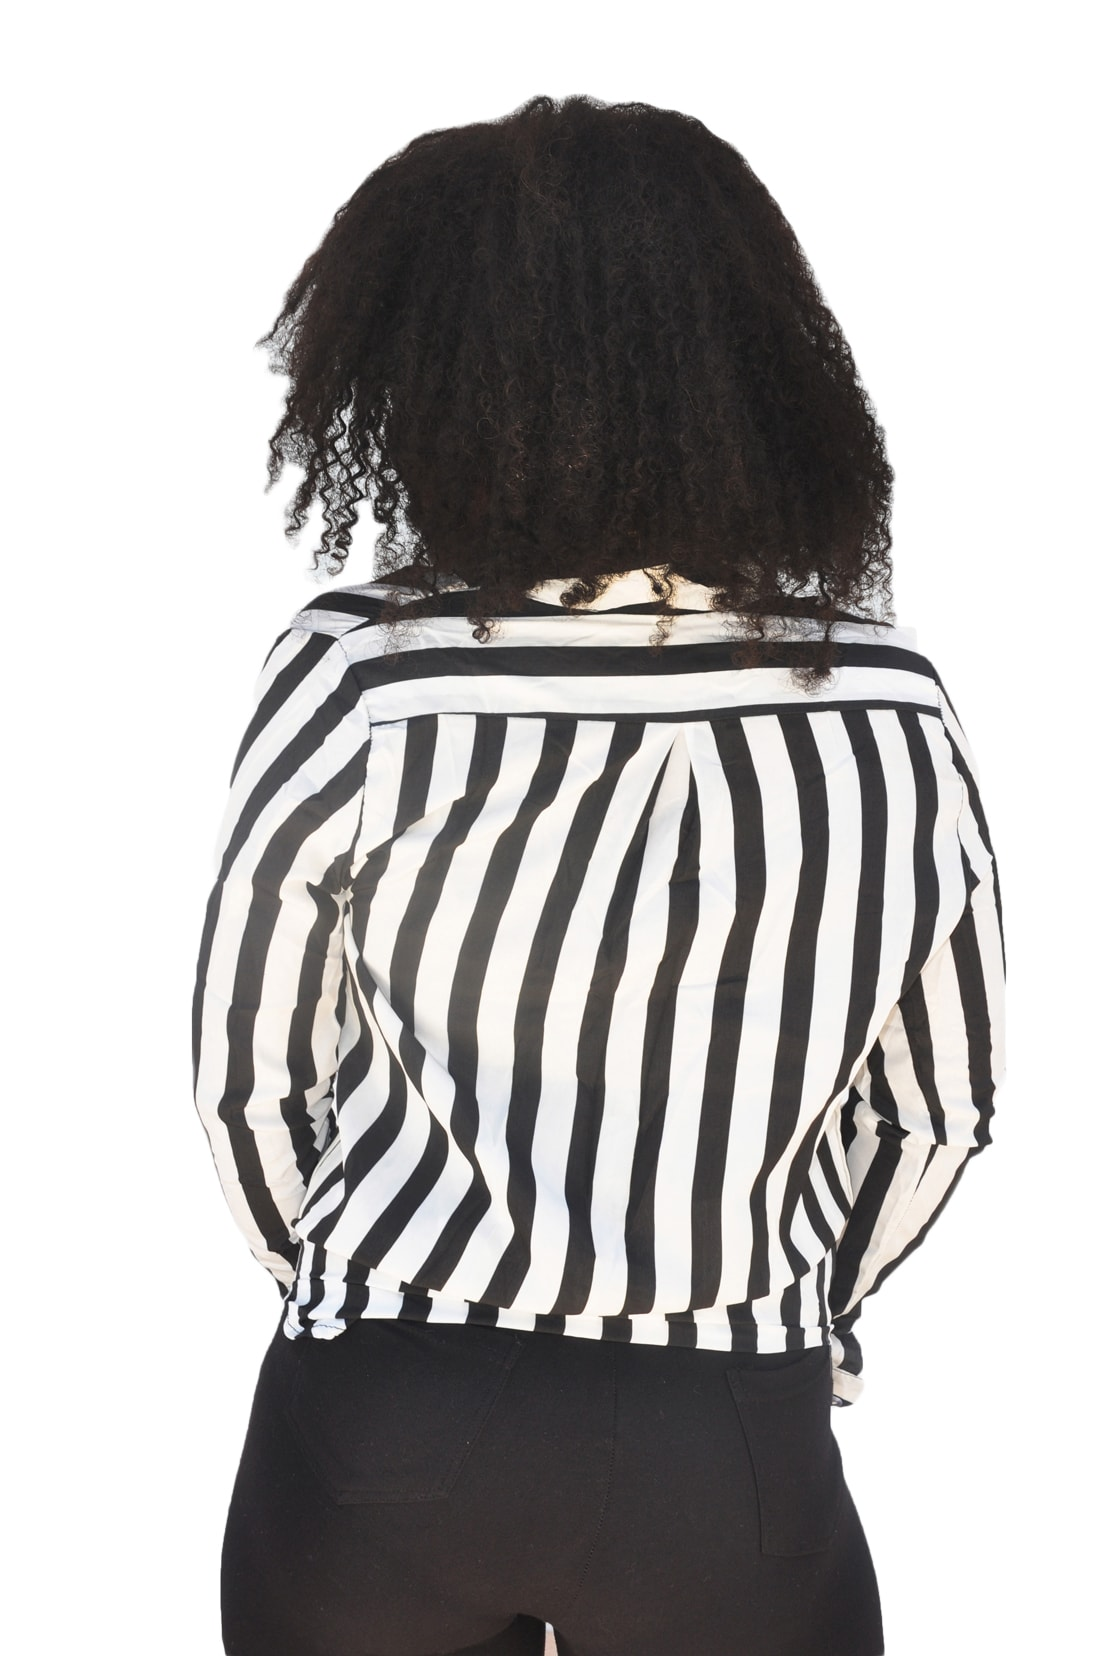 M0221 blackwhite2 Blouses Tops Shirts maureens.com boutique